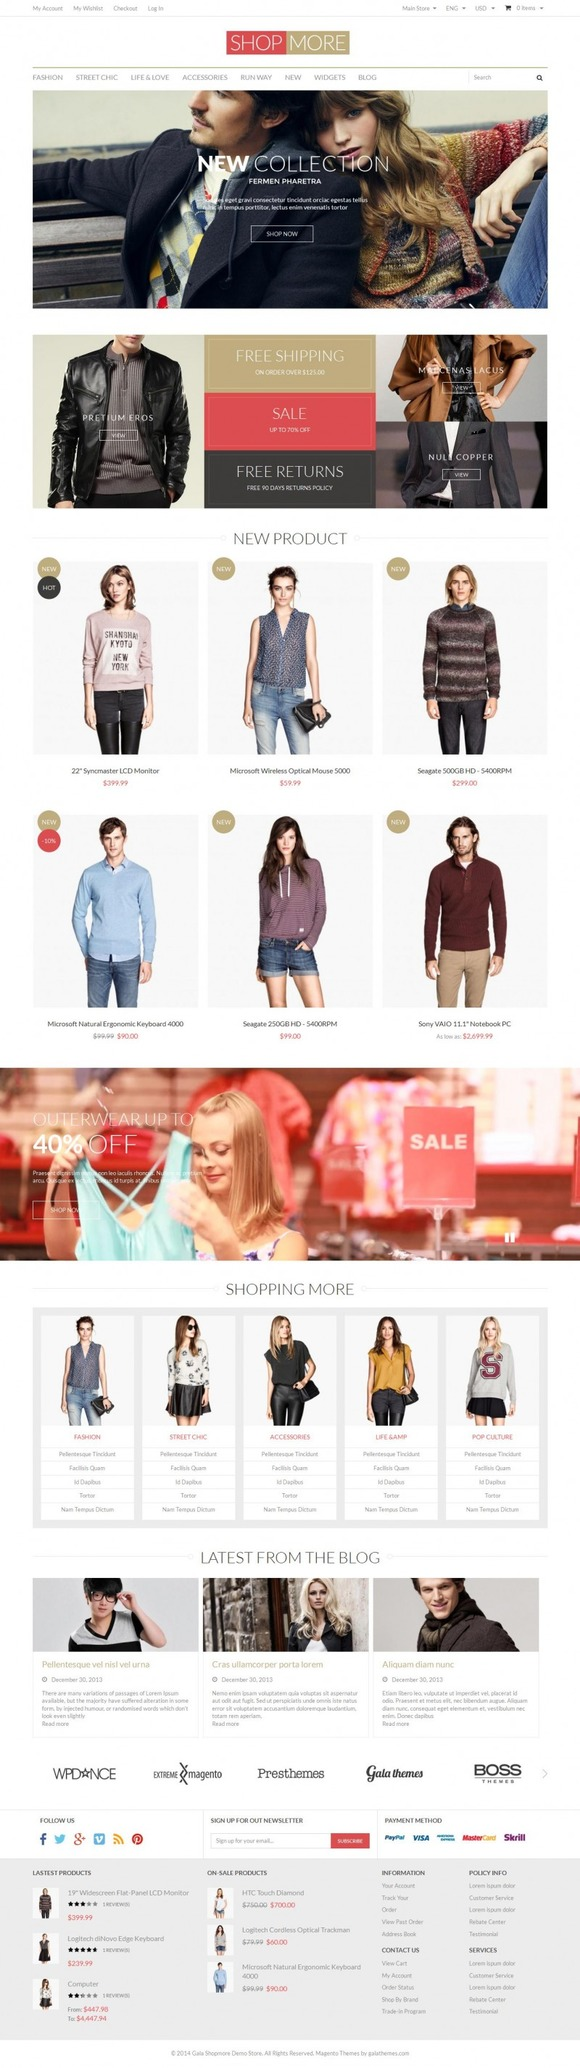 ShopMore Magento Theme